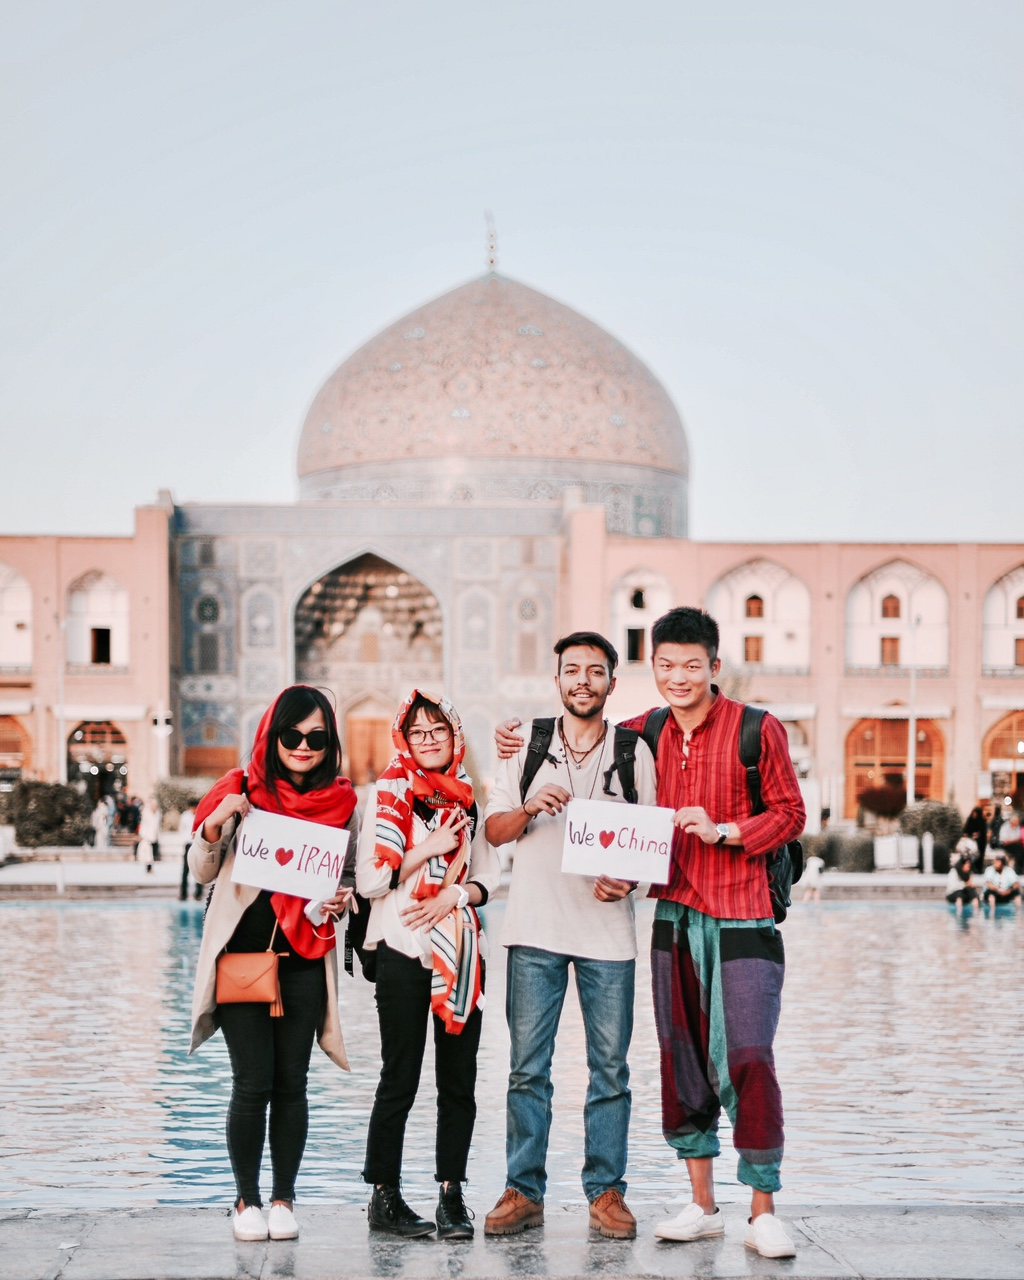 Alireza Takhsa with friends at Firuz Bahram School, Tehran